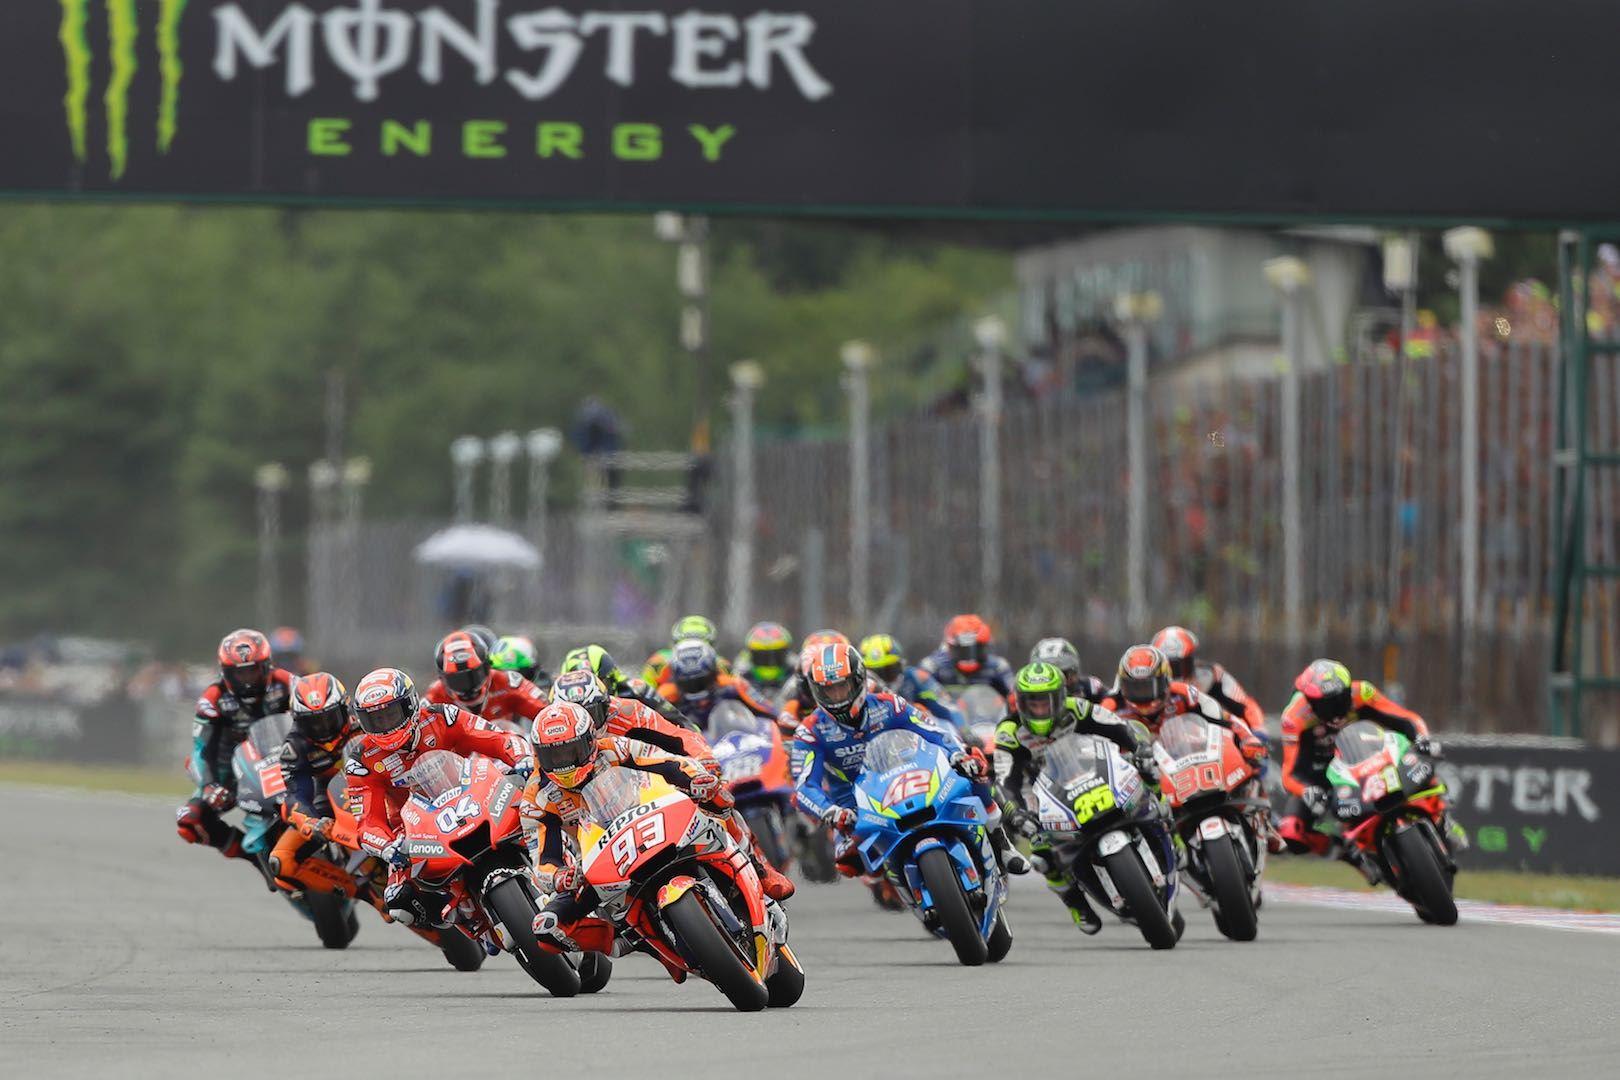 Calendario Moto 2020.Motogp Calendario Provisorio De 2020 Com Vinte Grandes